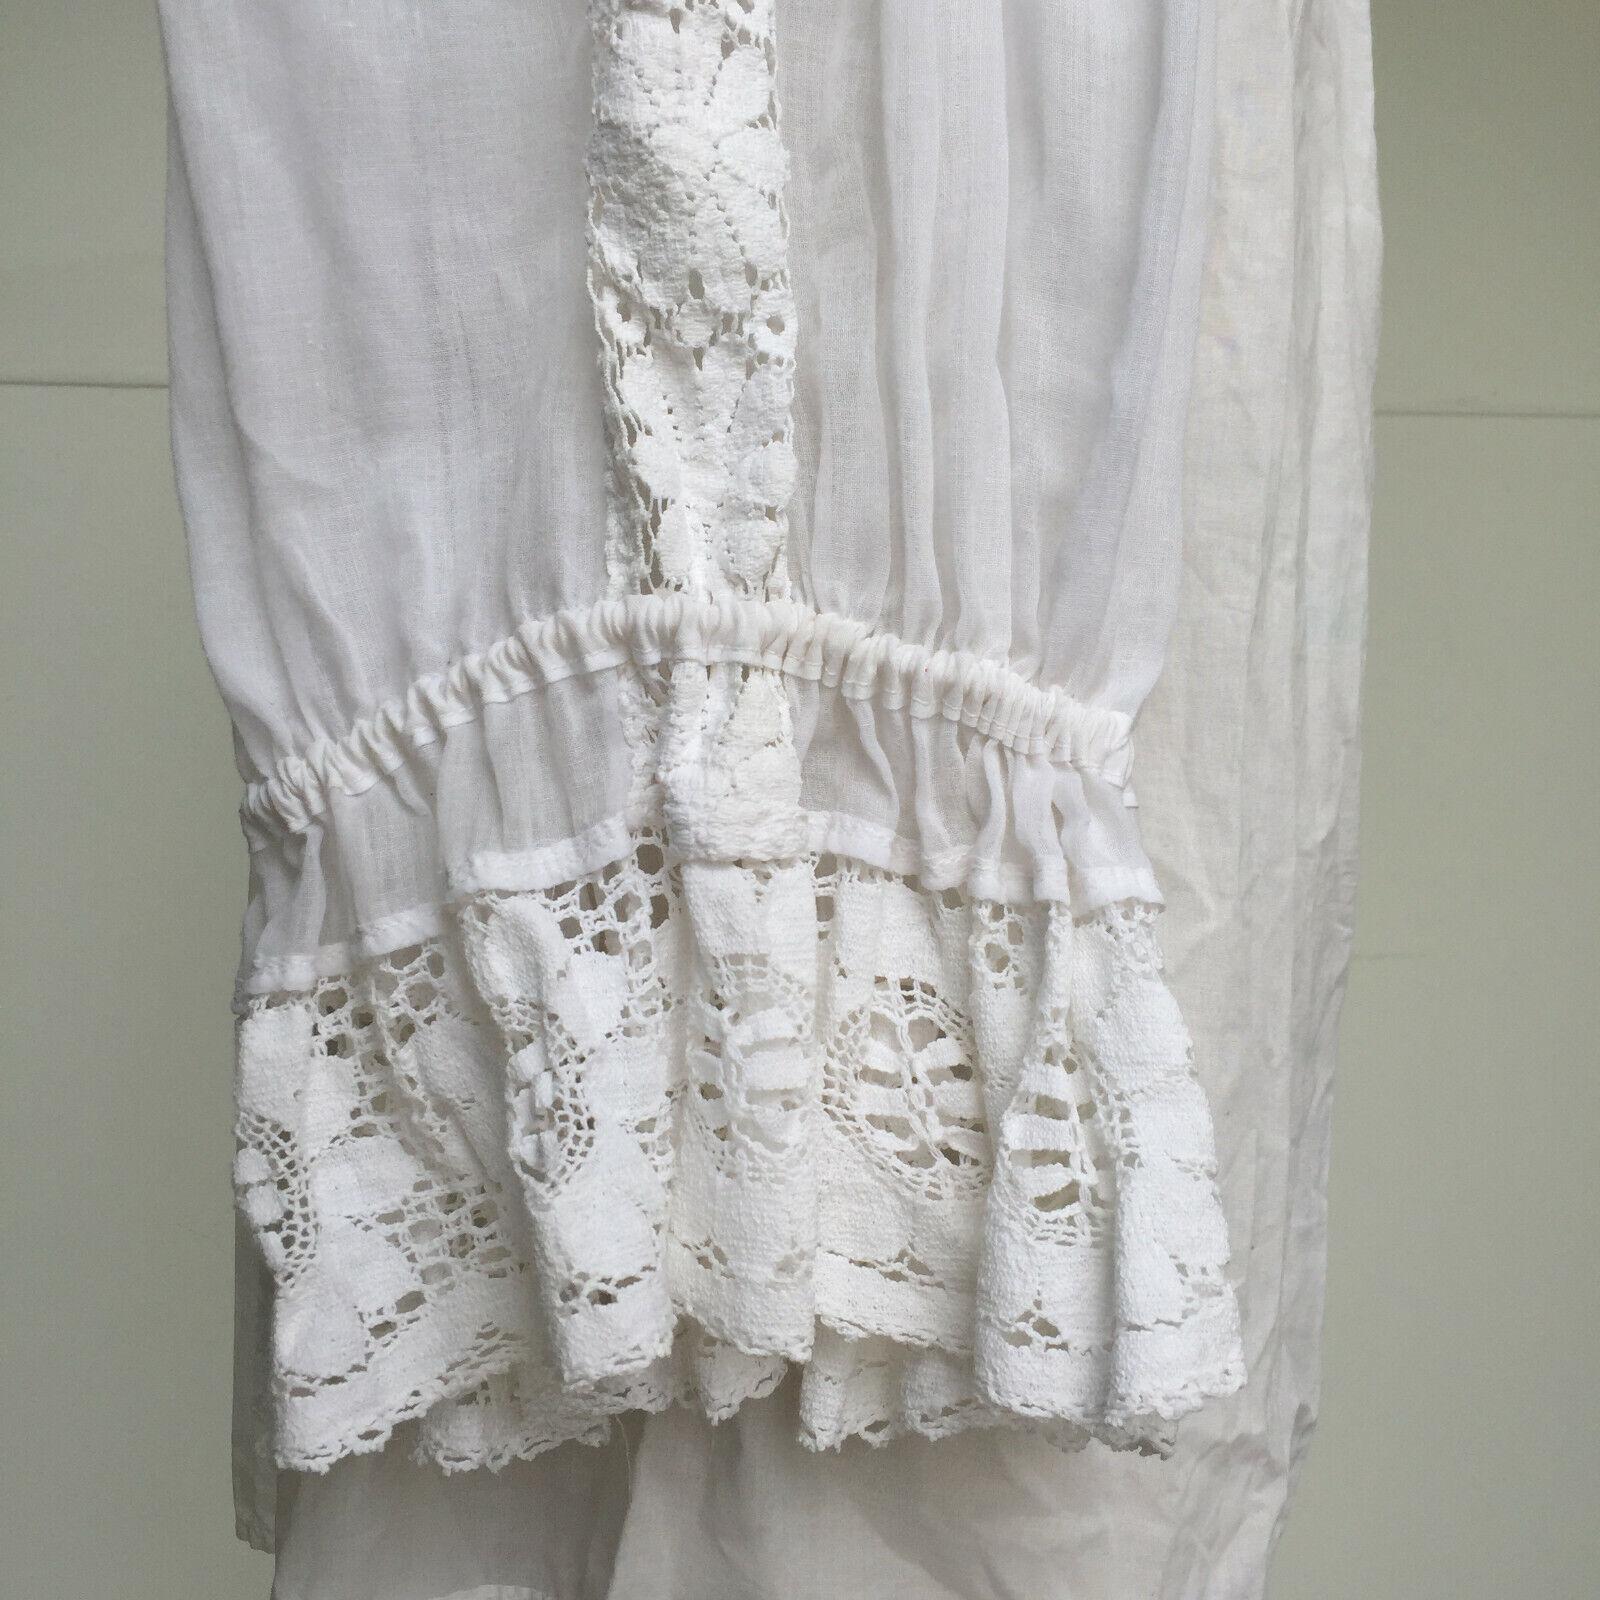 VTG 1970s Hungarian Handmade Textured Boho-Chic P… - image 12